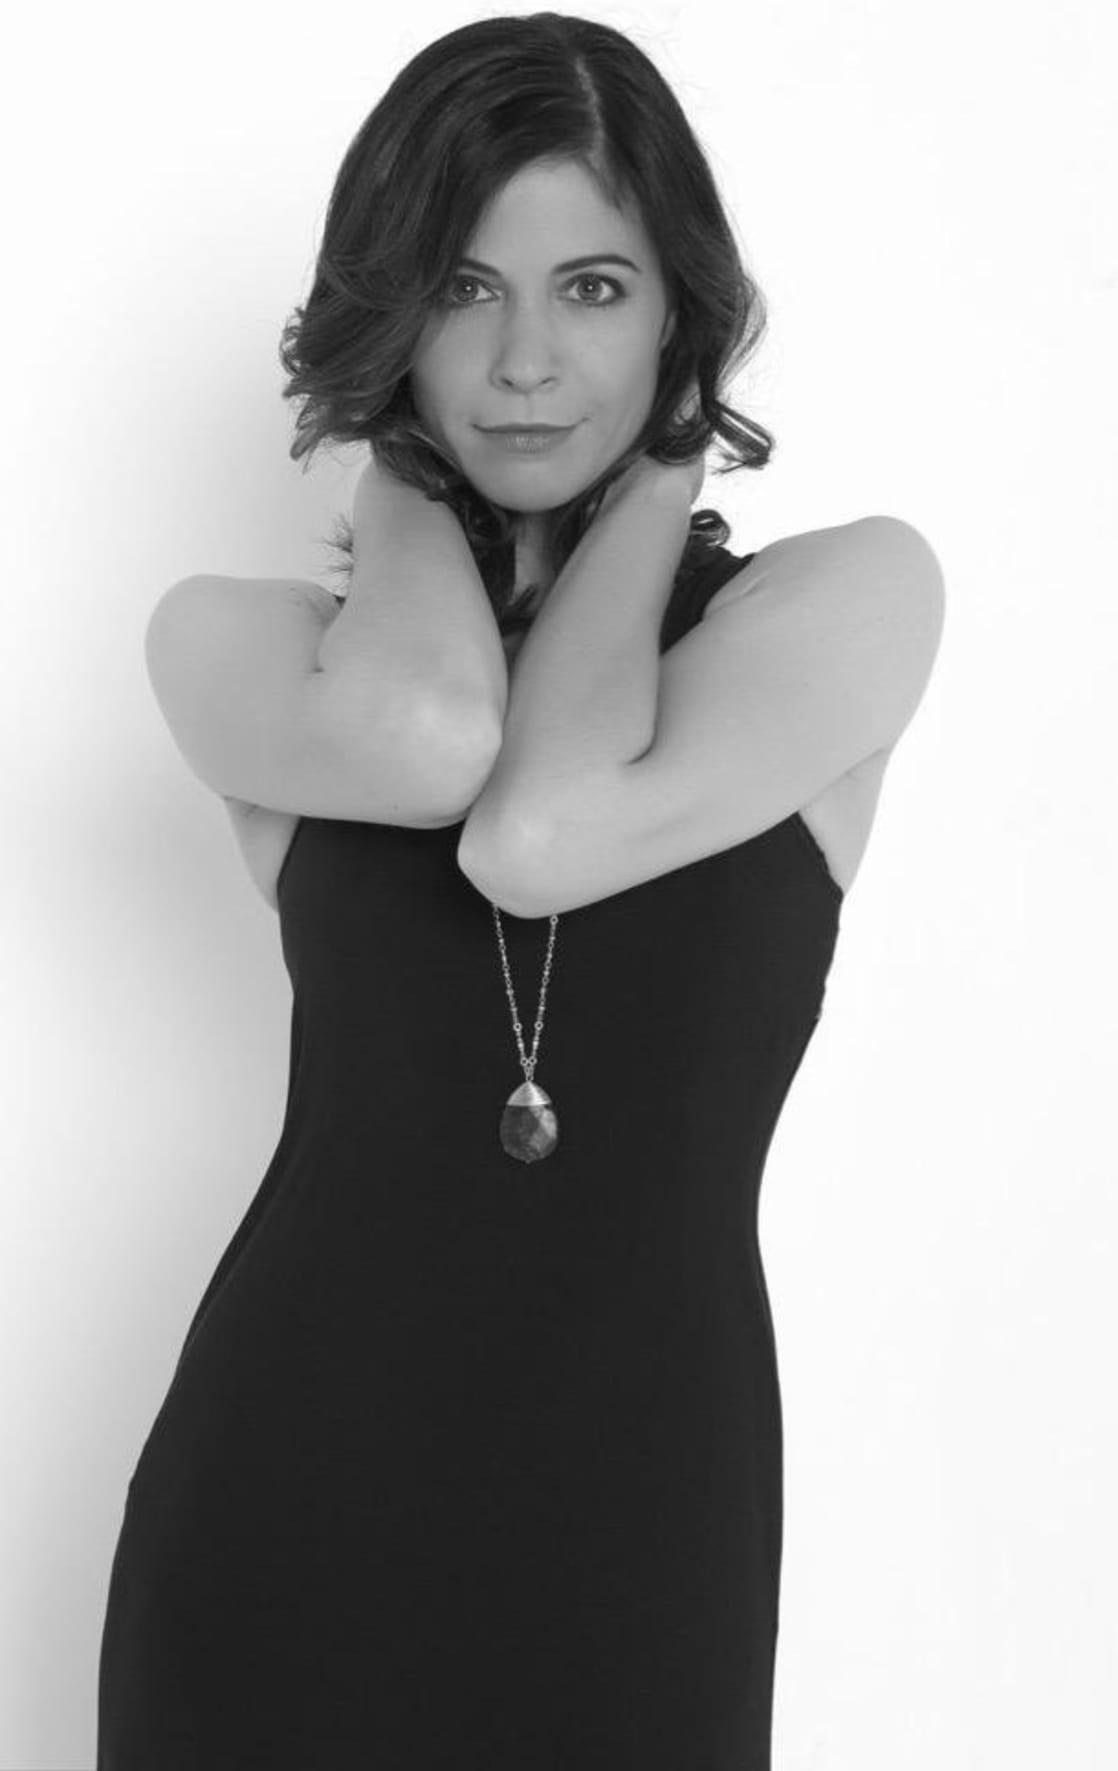 Sheree North Hot pics & movies Lola Skrbkova,Cara Theobold